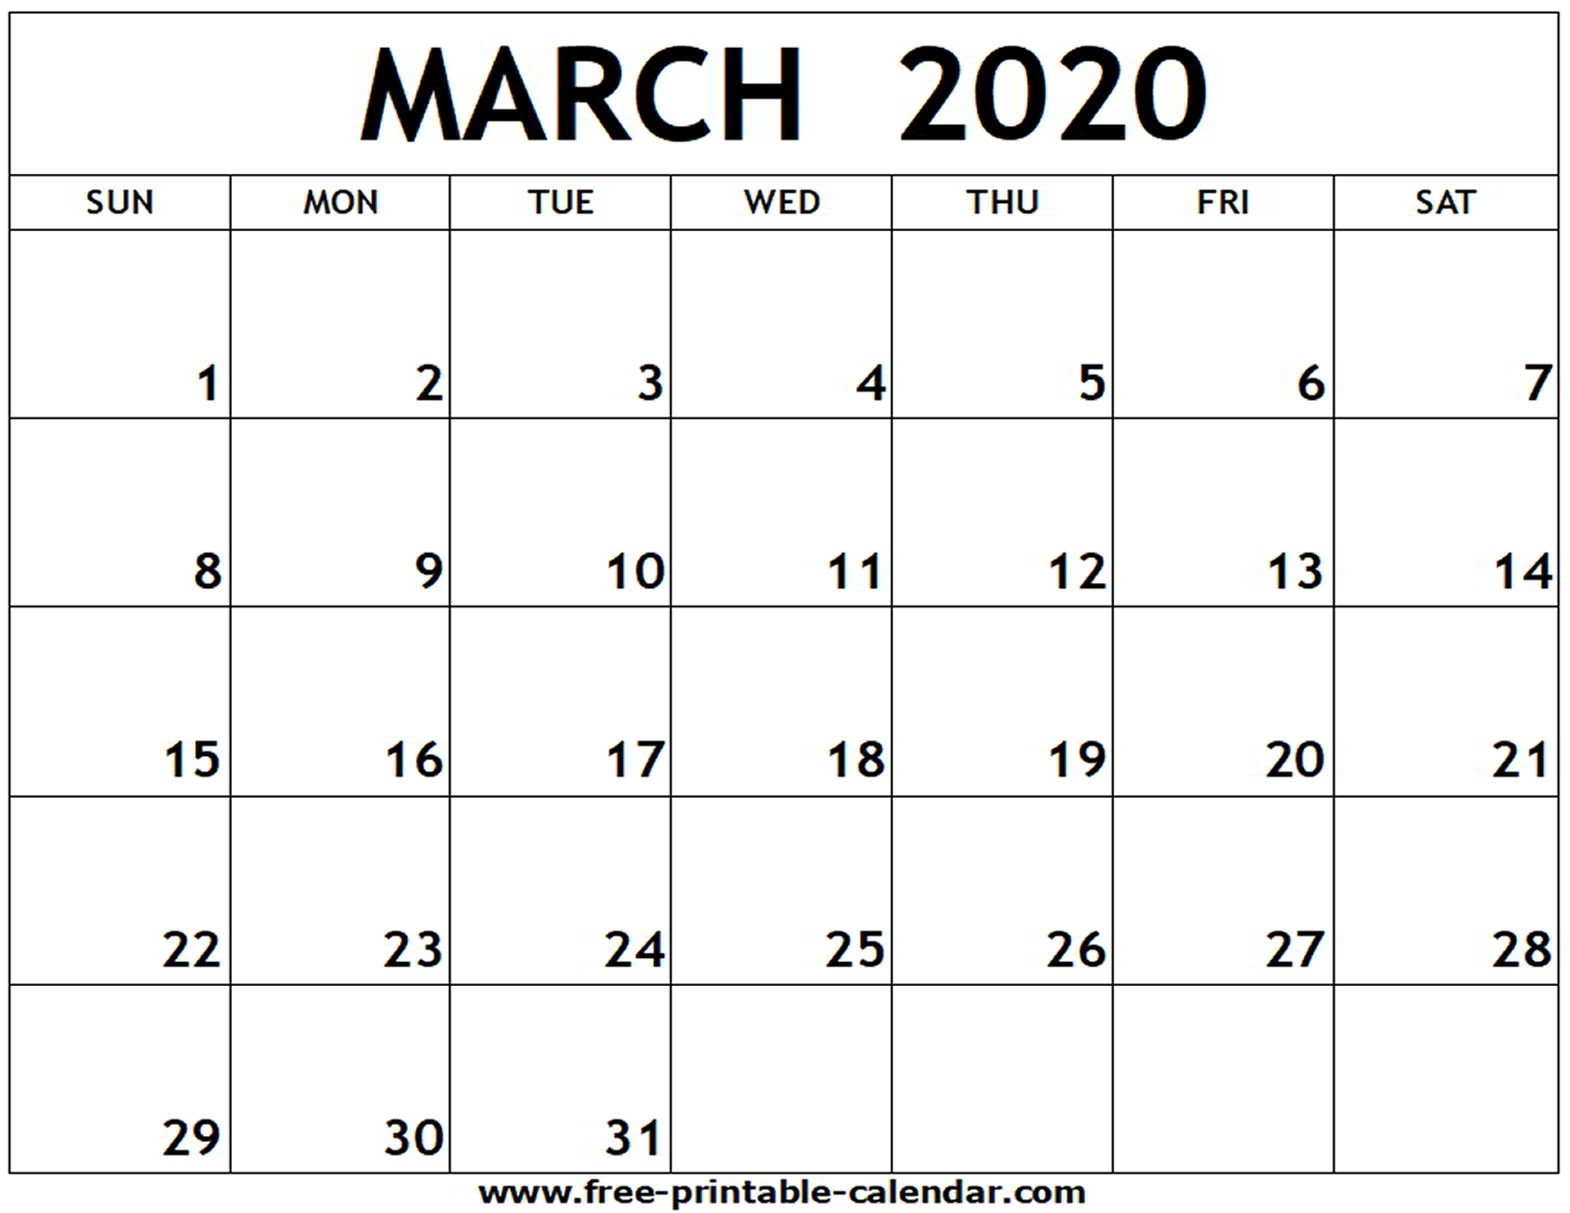 March 2020 Printable Calendar - Free-Printable-Calendar  Blank Calendar 2020